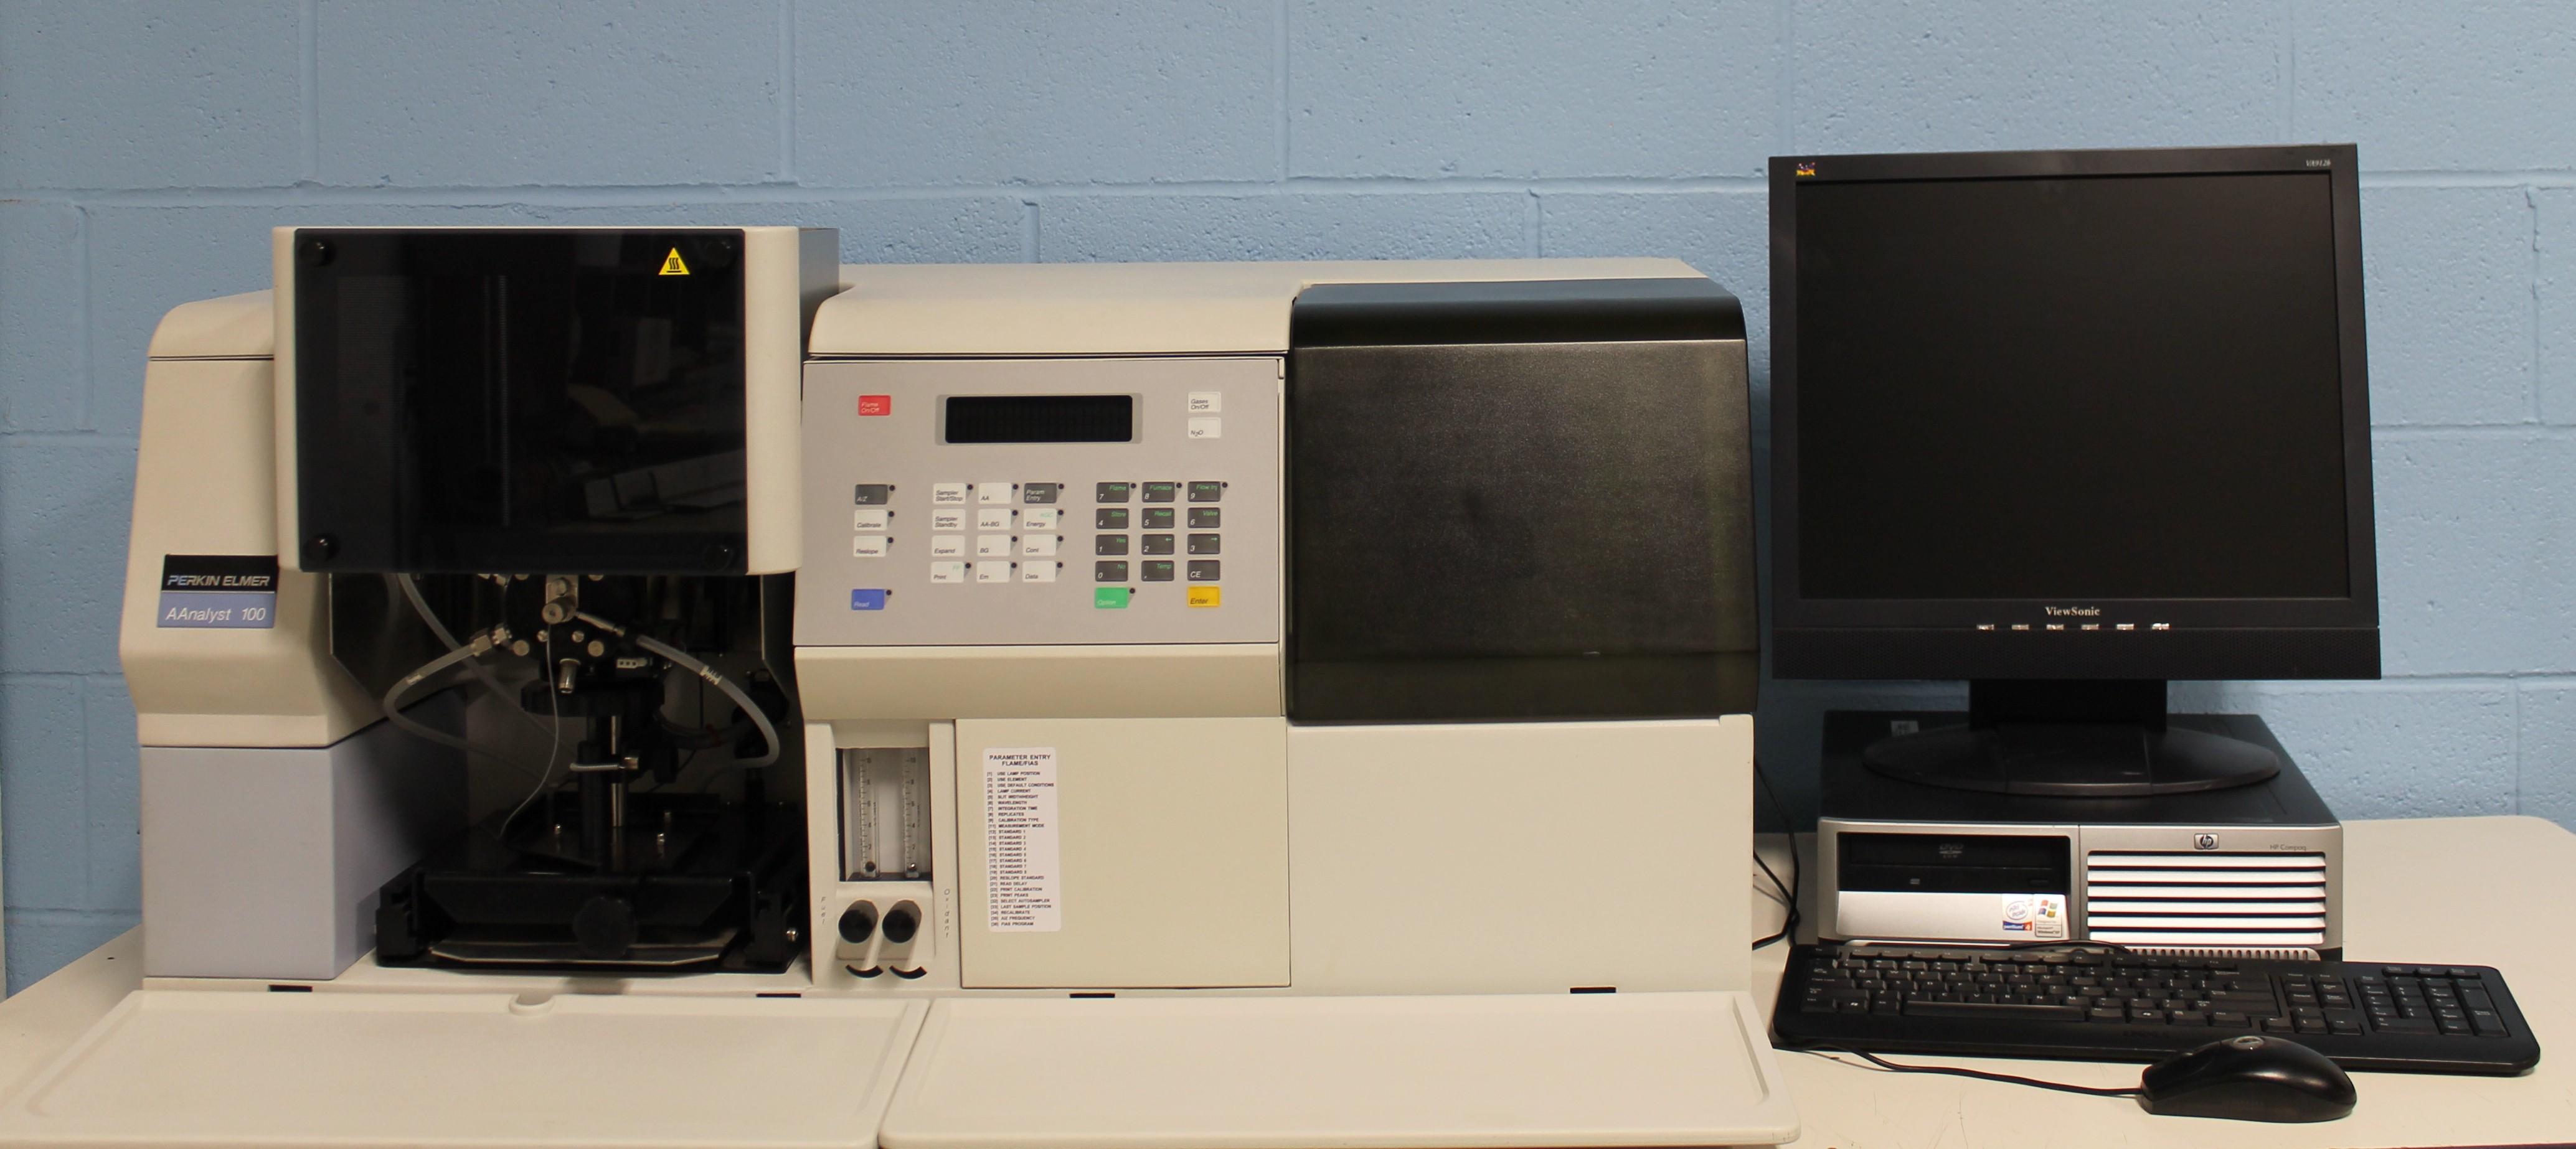 PerkinElmer AAnalyst 100 Atomic Absorption Spectrometer Image